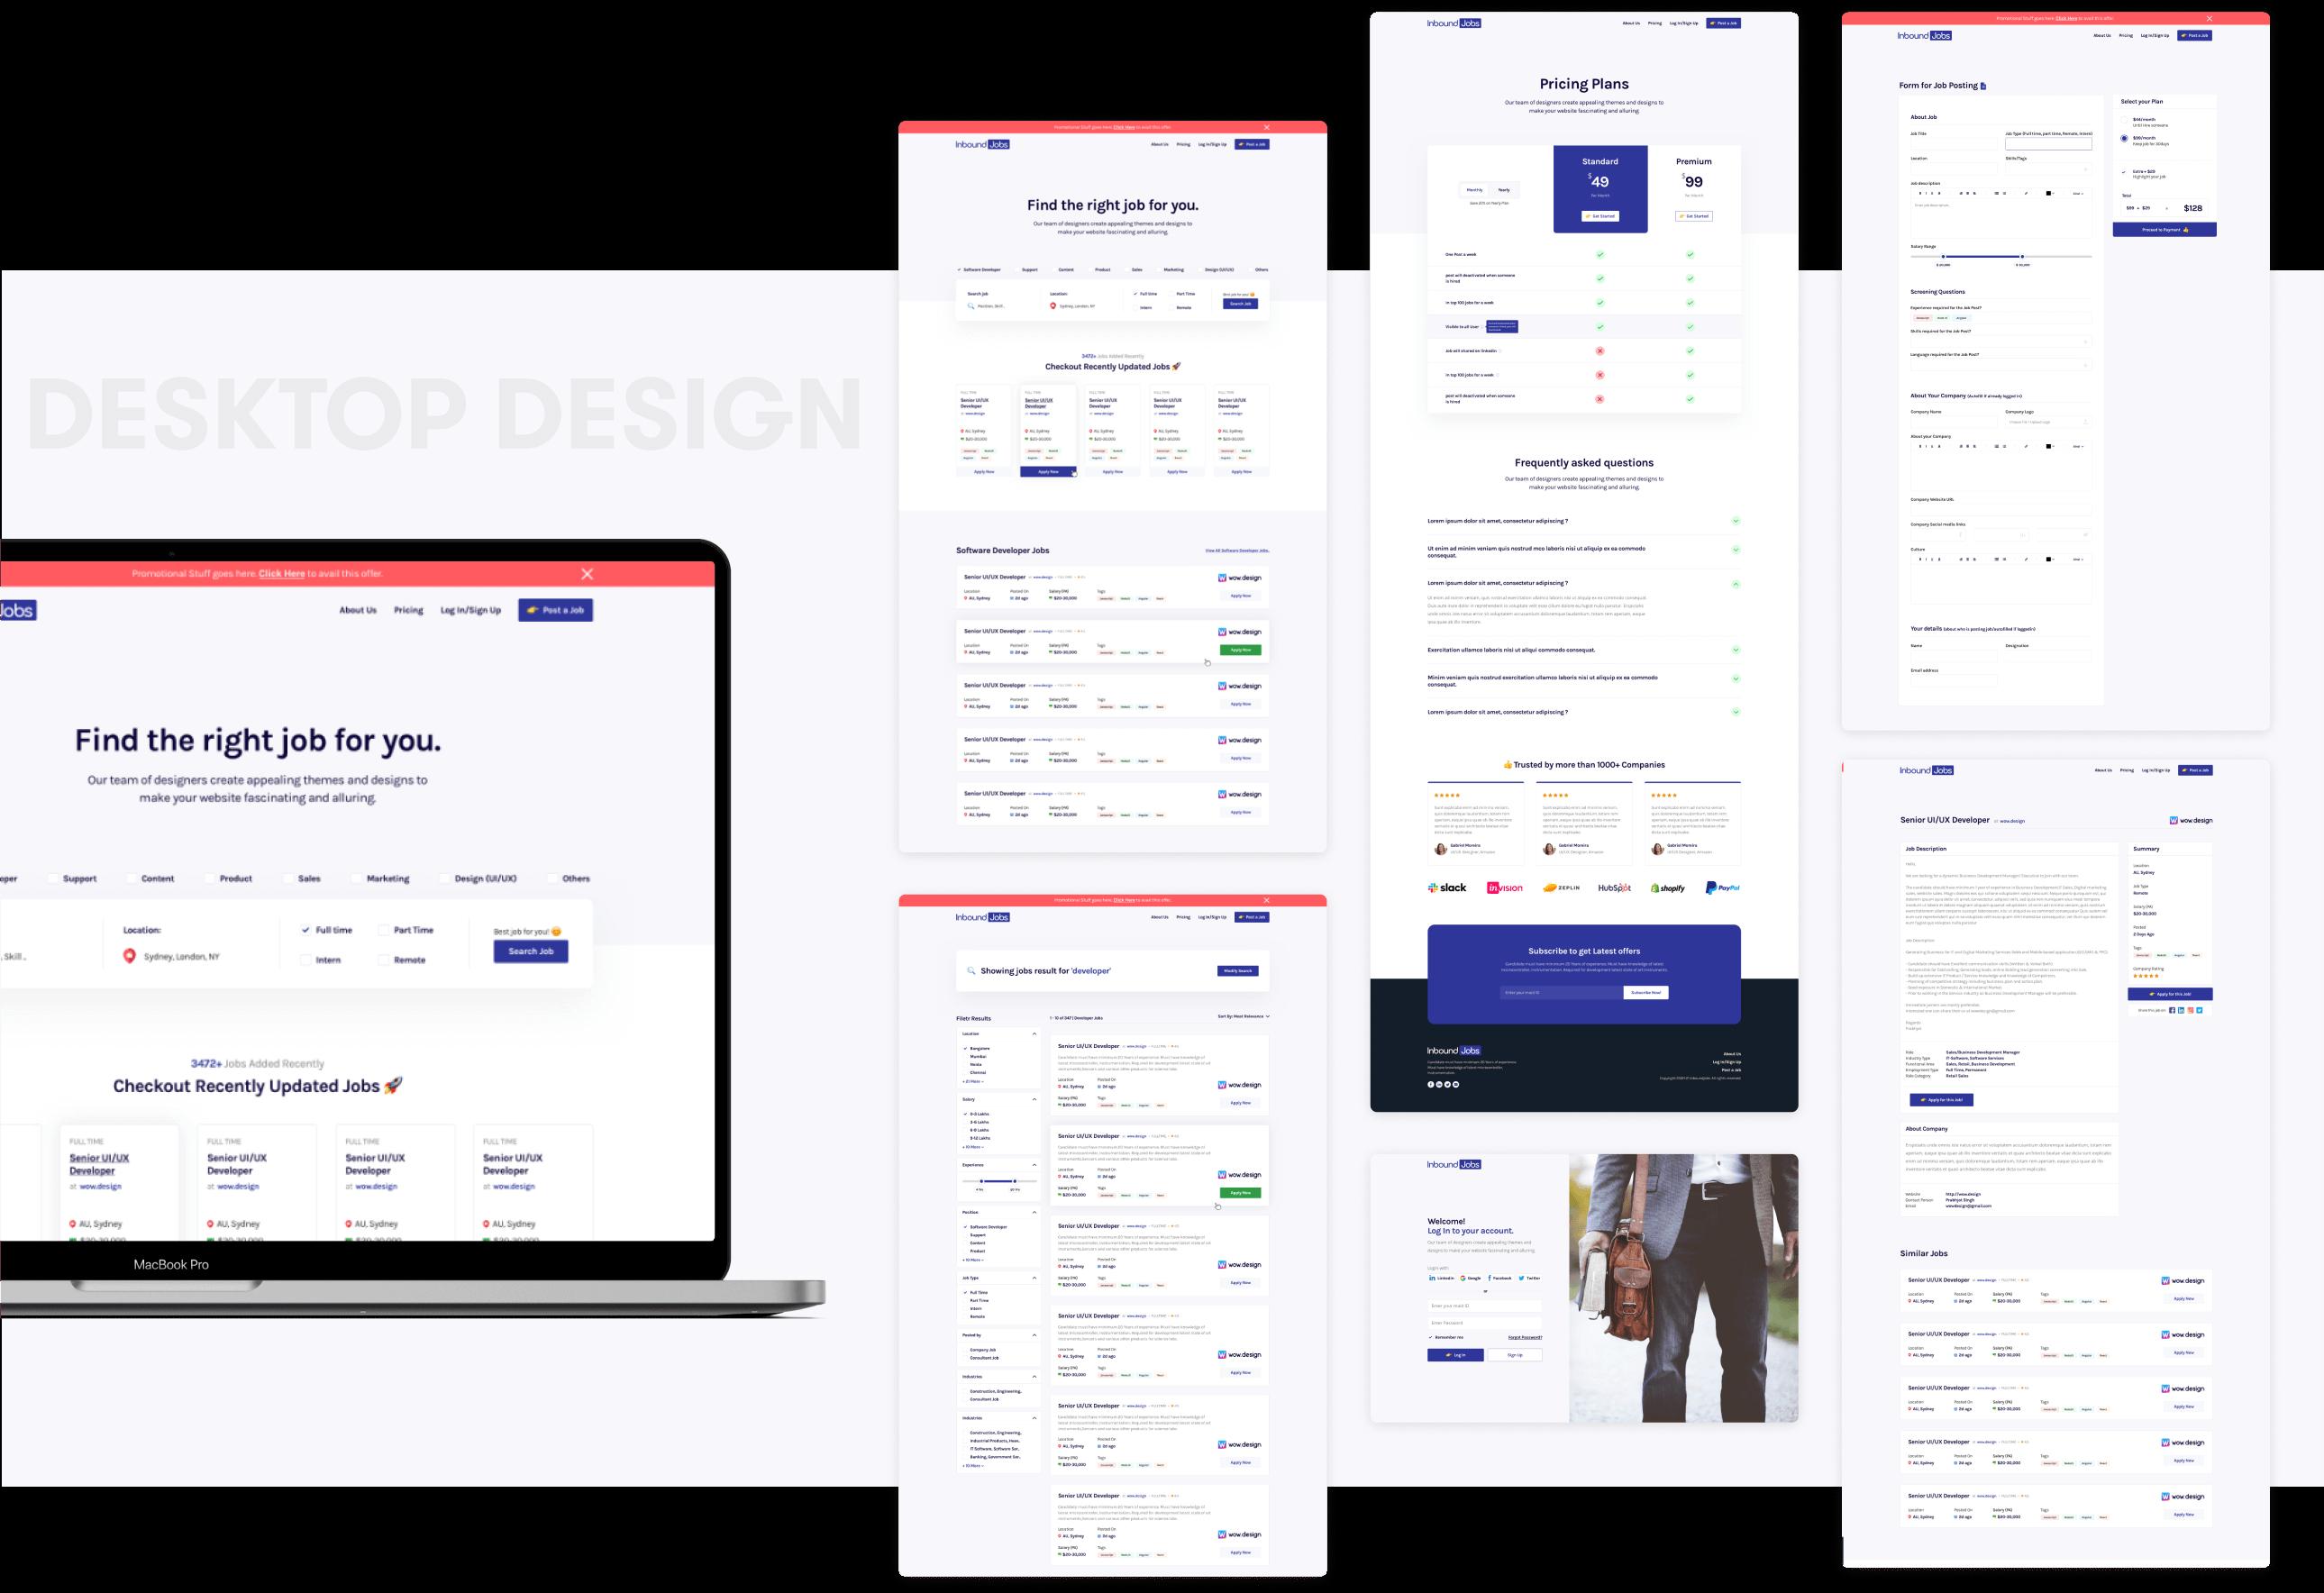 Job Board Desktop Design and Development by wowdesign